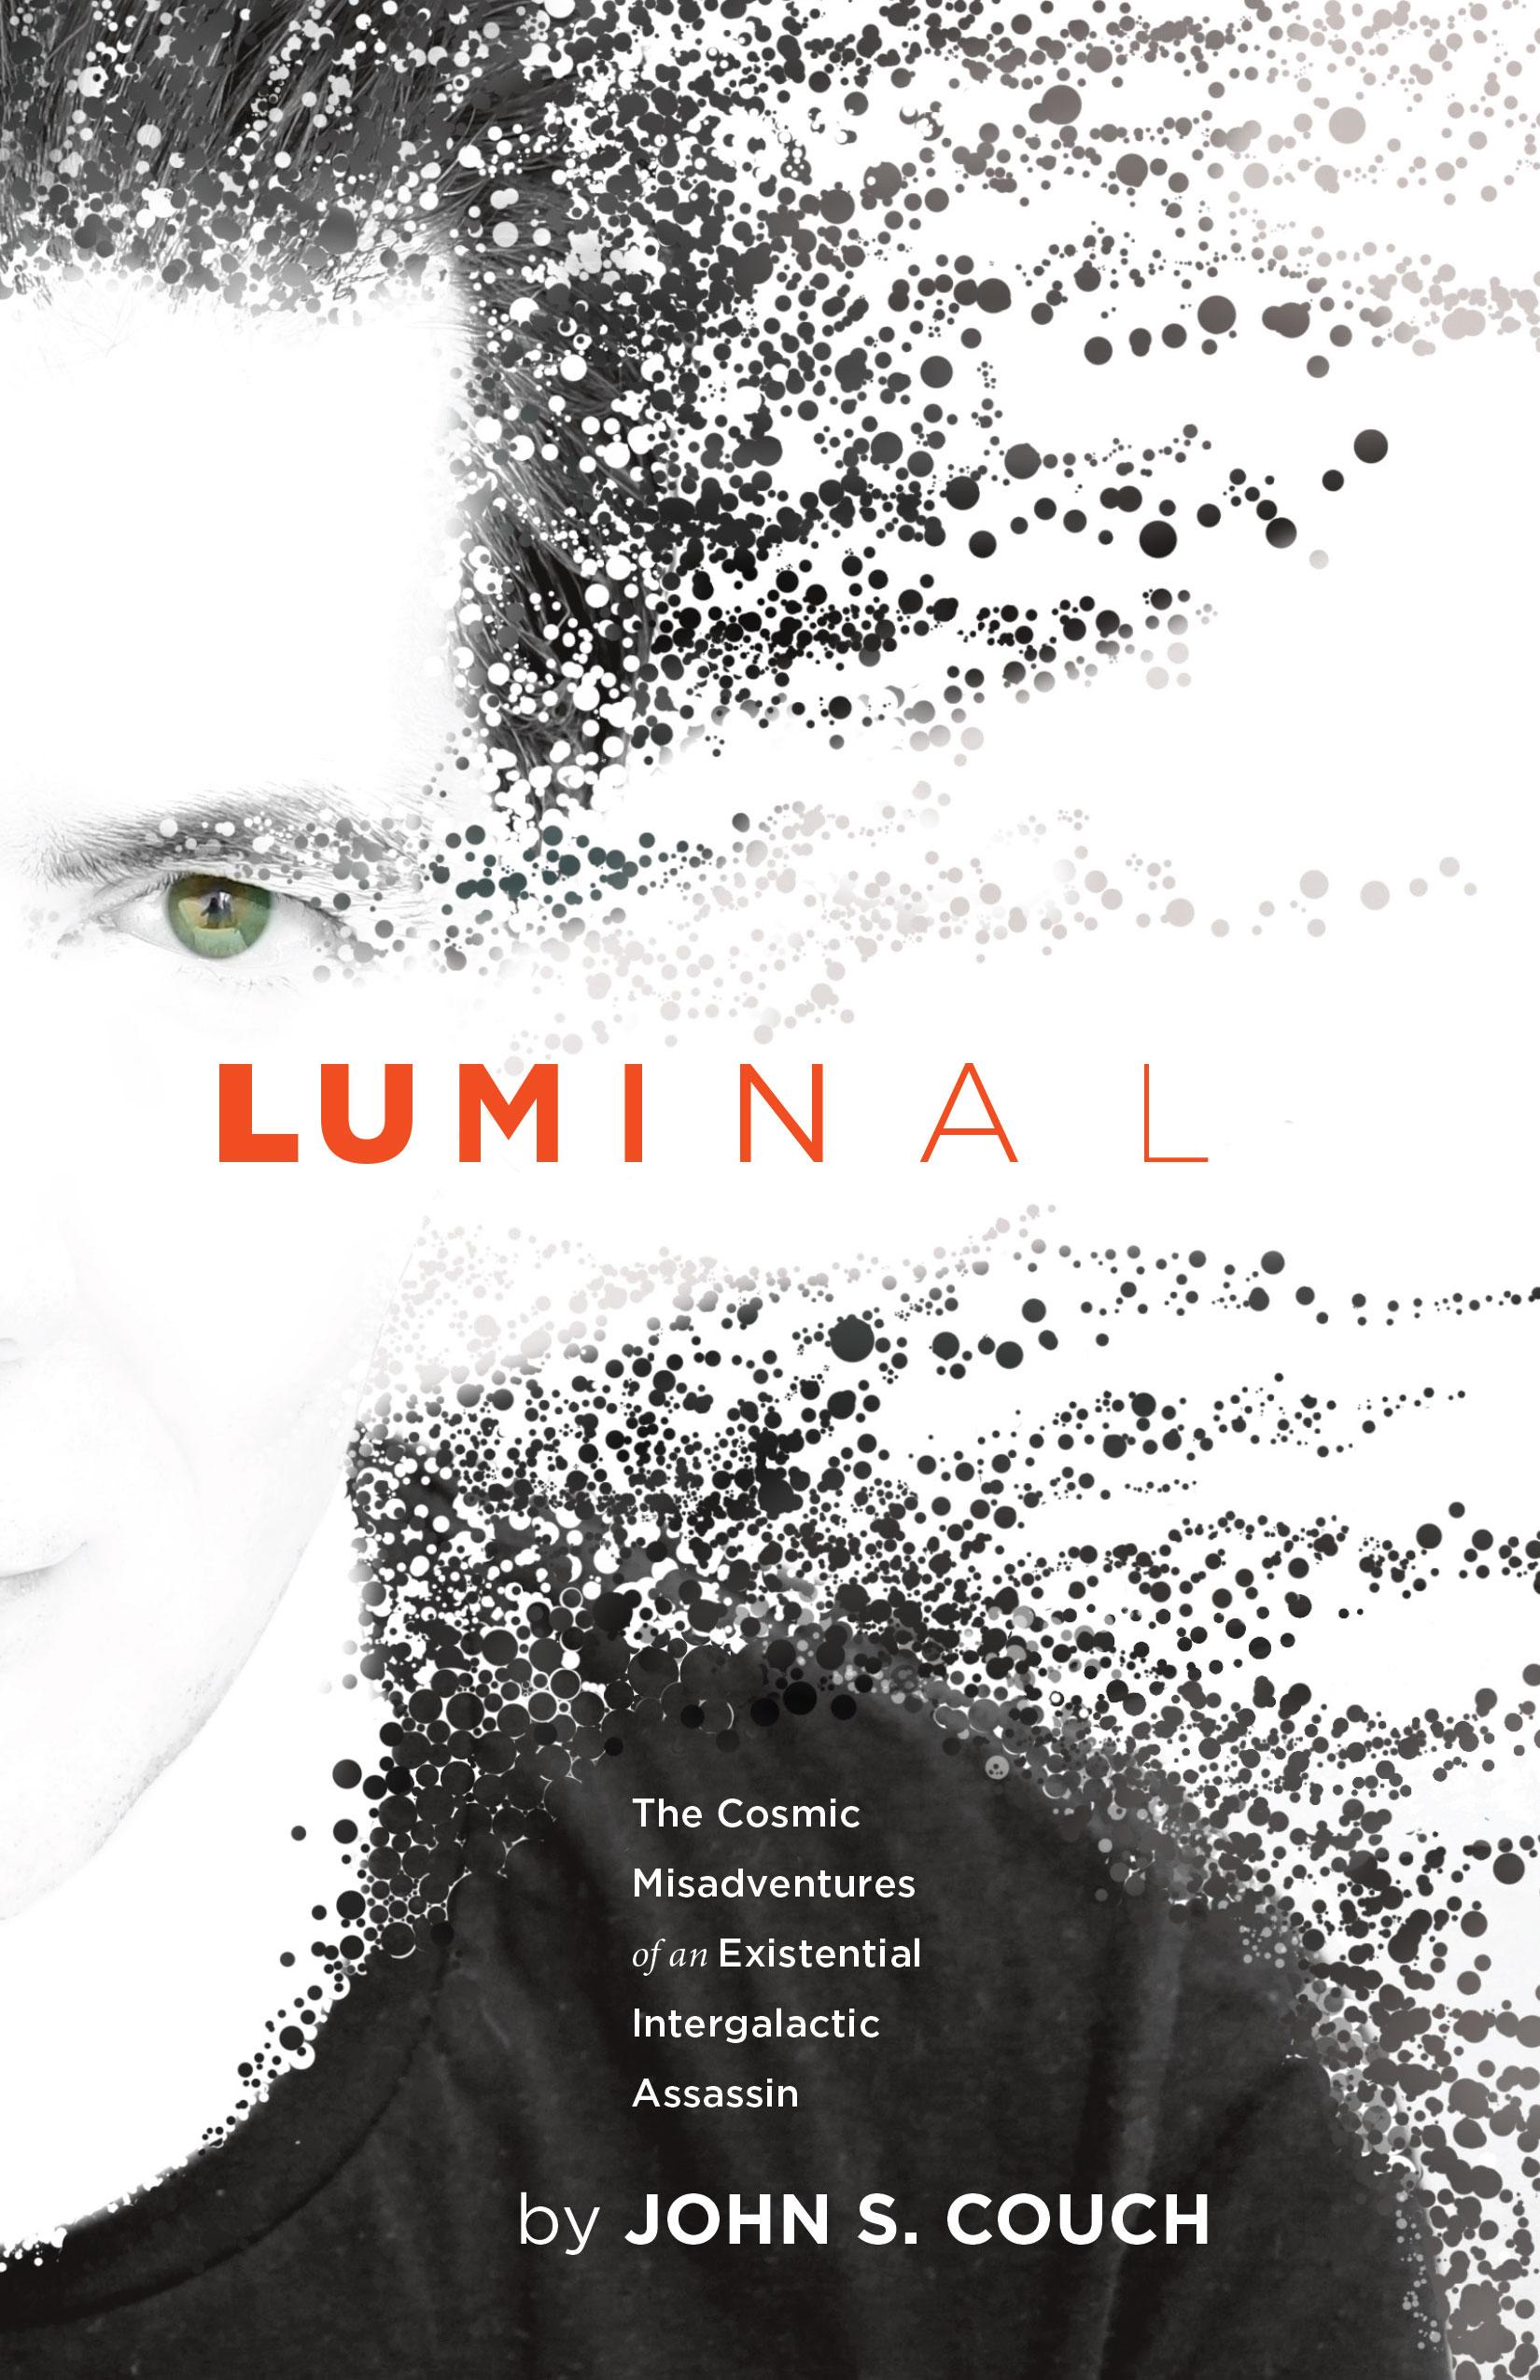 Luminal_cover-1.jpg